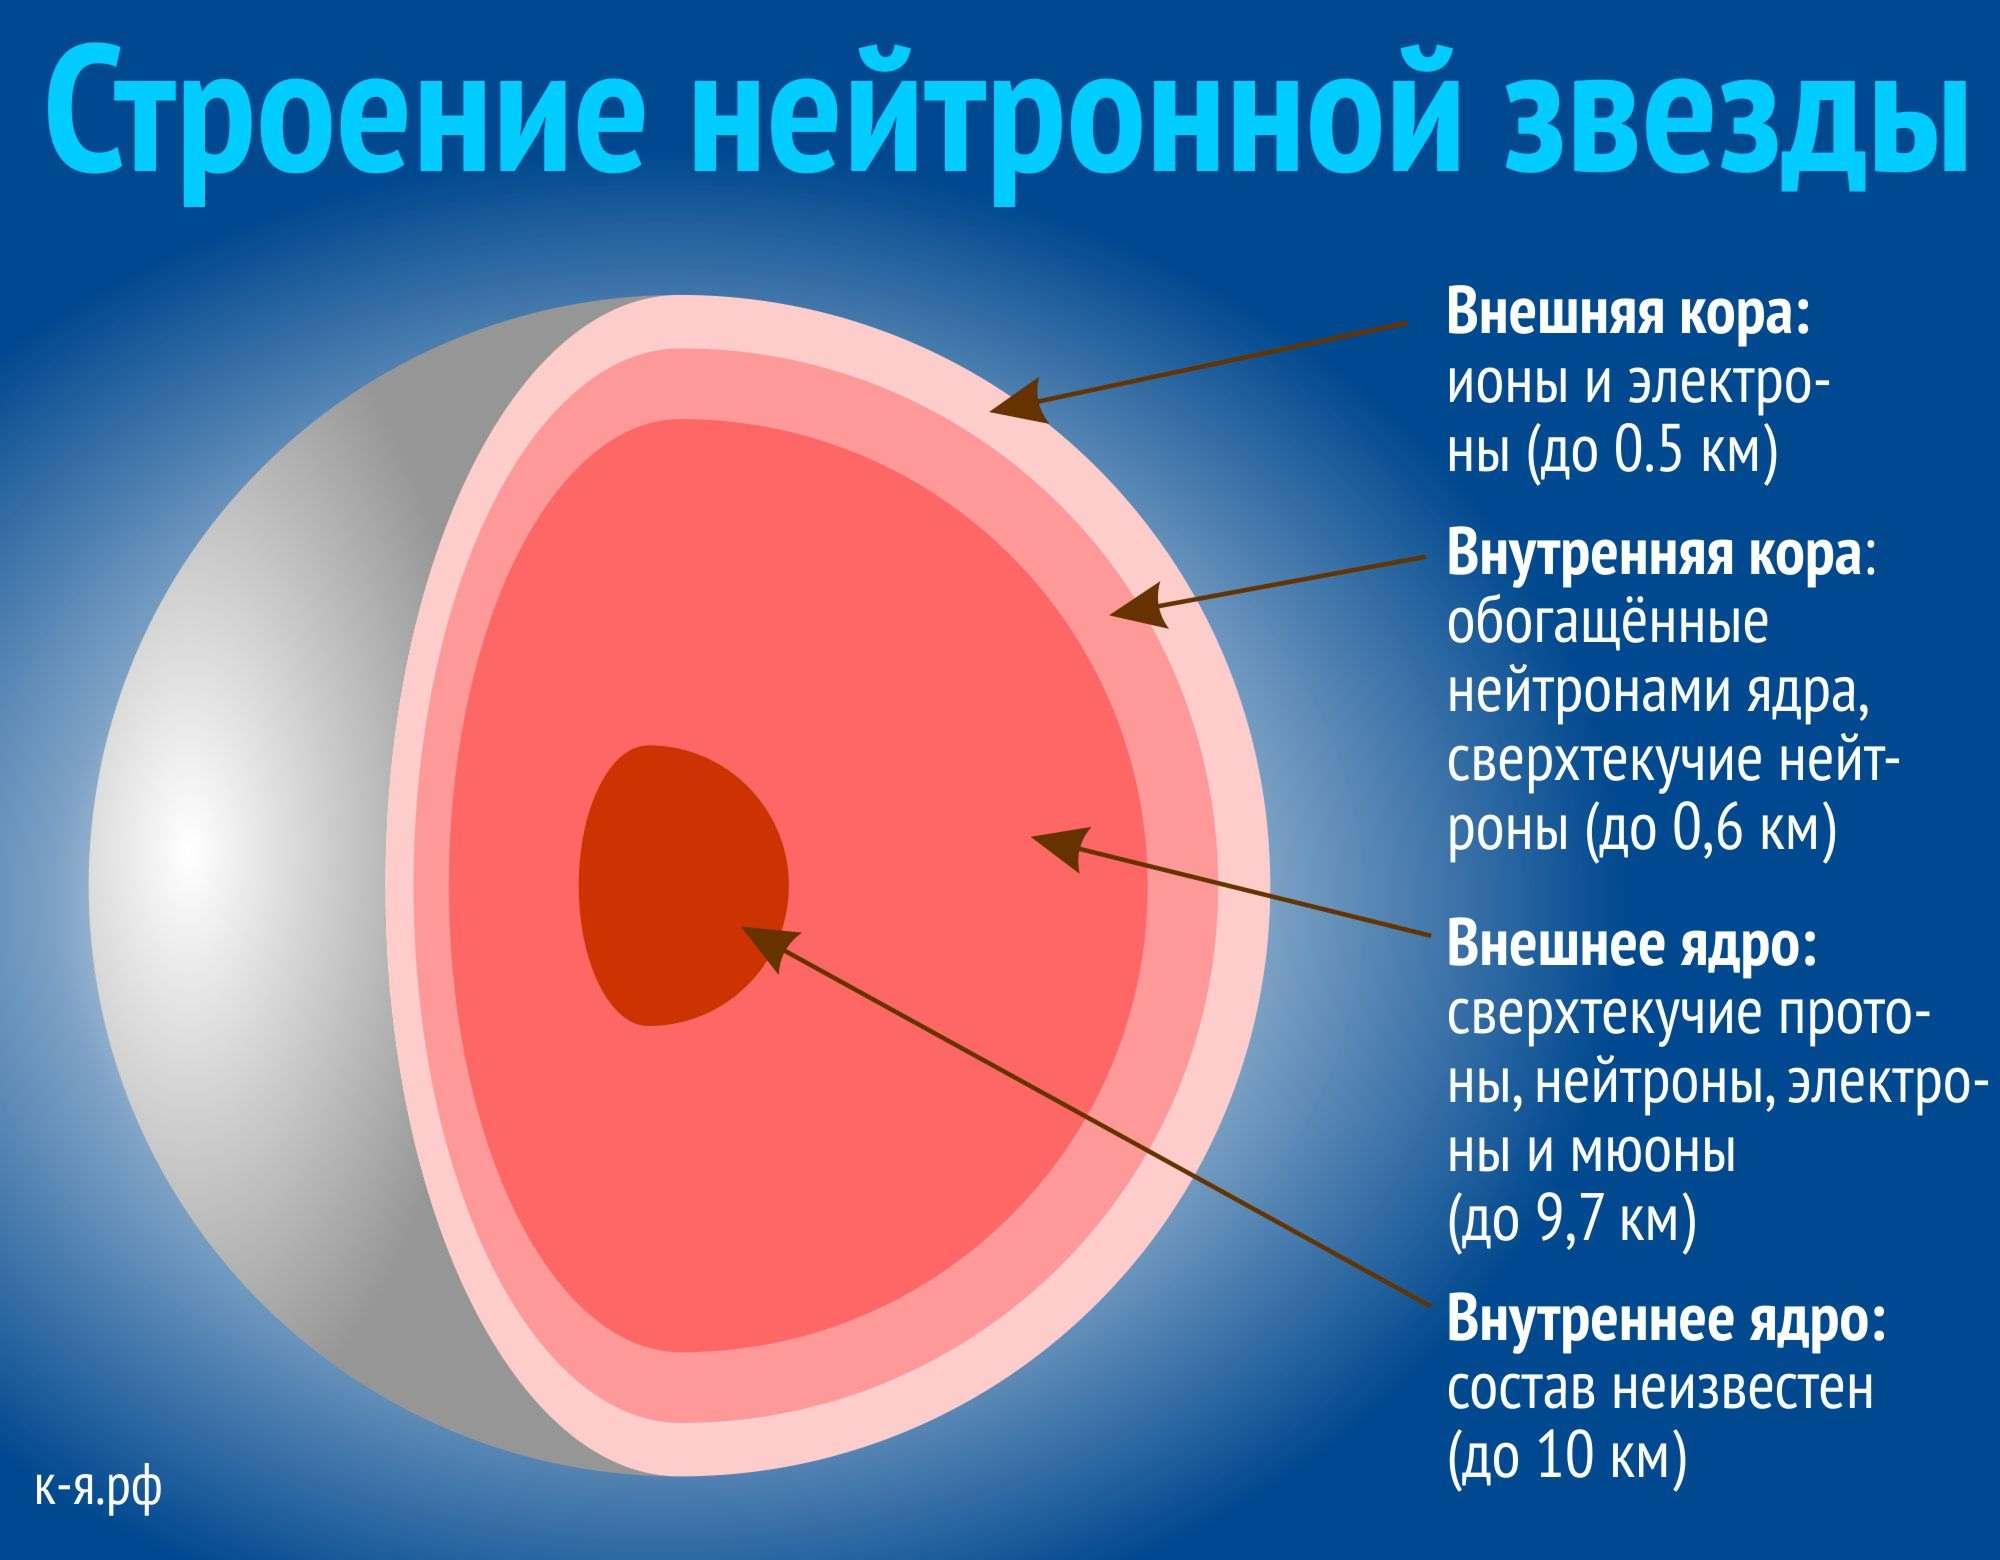 Нейтронная звезда в разрезе (v.uecdn.es).